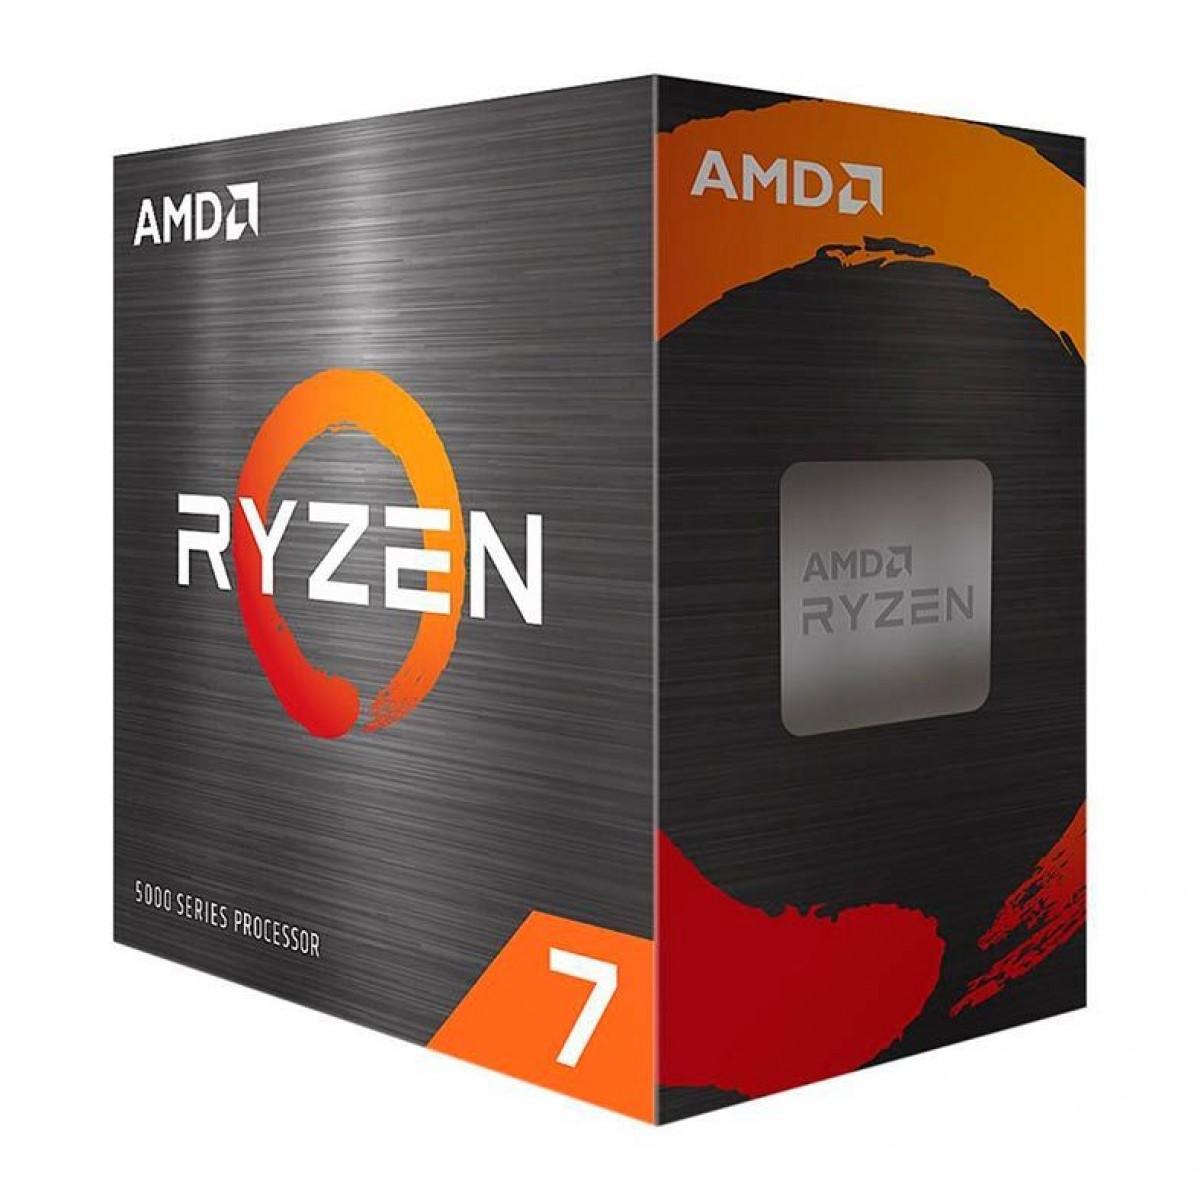 Kit Upgrade, ASUS Prime B550M-K + AMD Ryzen 7 5700G + Memória DDR4, 8GB 3000MHz